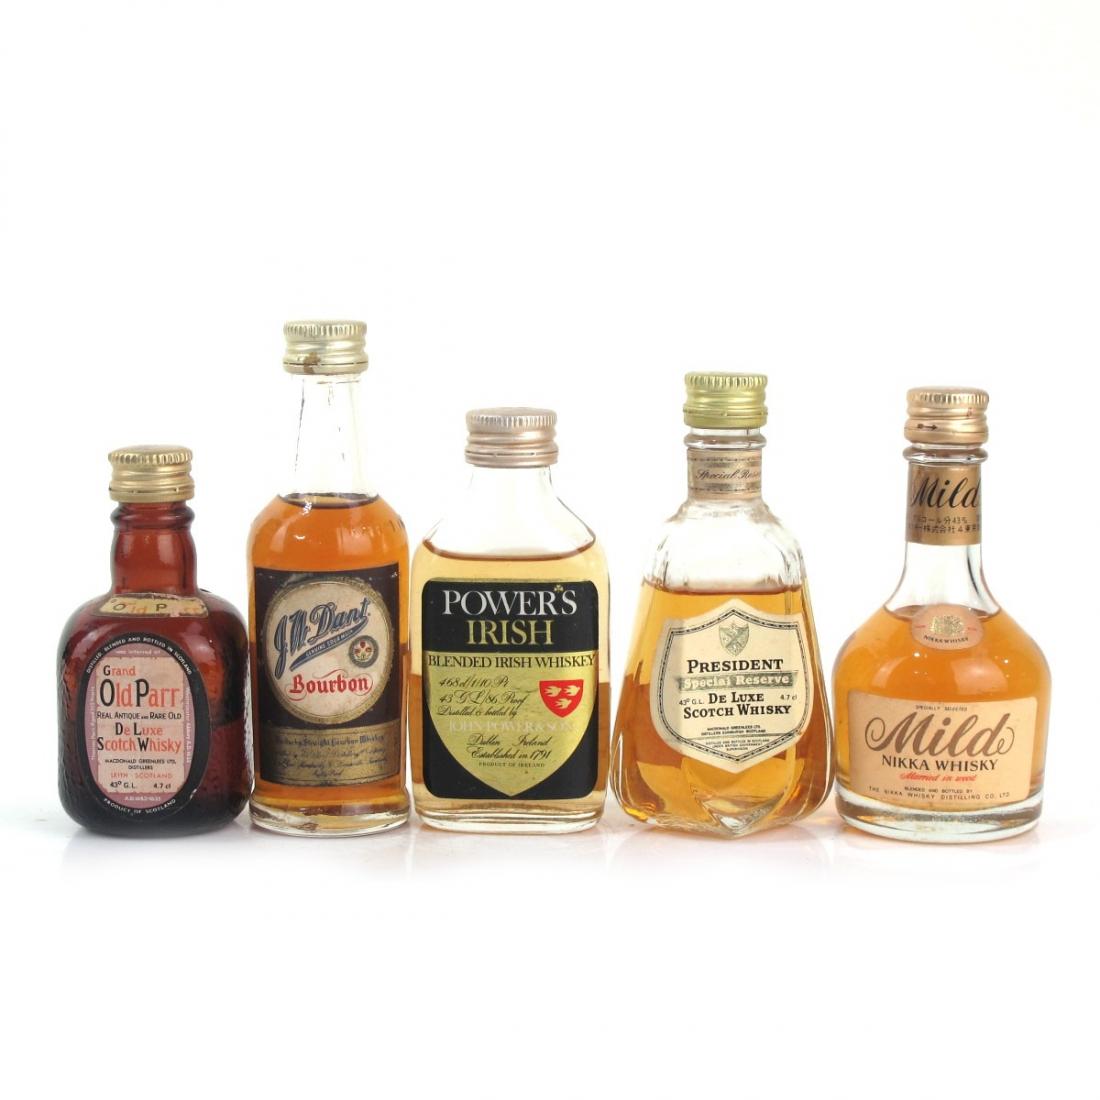 Miscellaneous Single Malt Miniature Selection x 5 / includes Powers, President, J.W Dant, Nikka Mild & Grand Old Parr